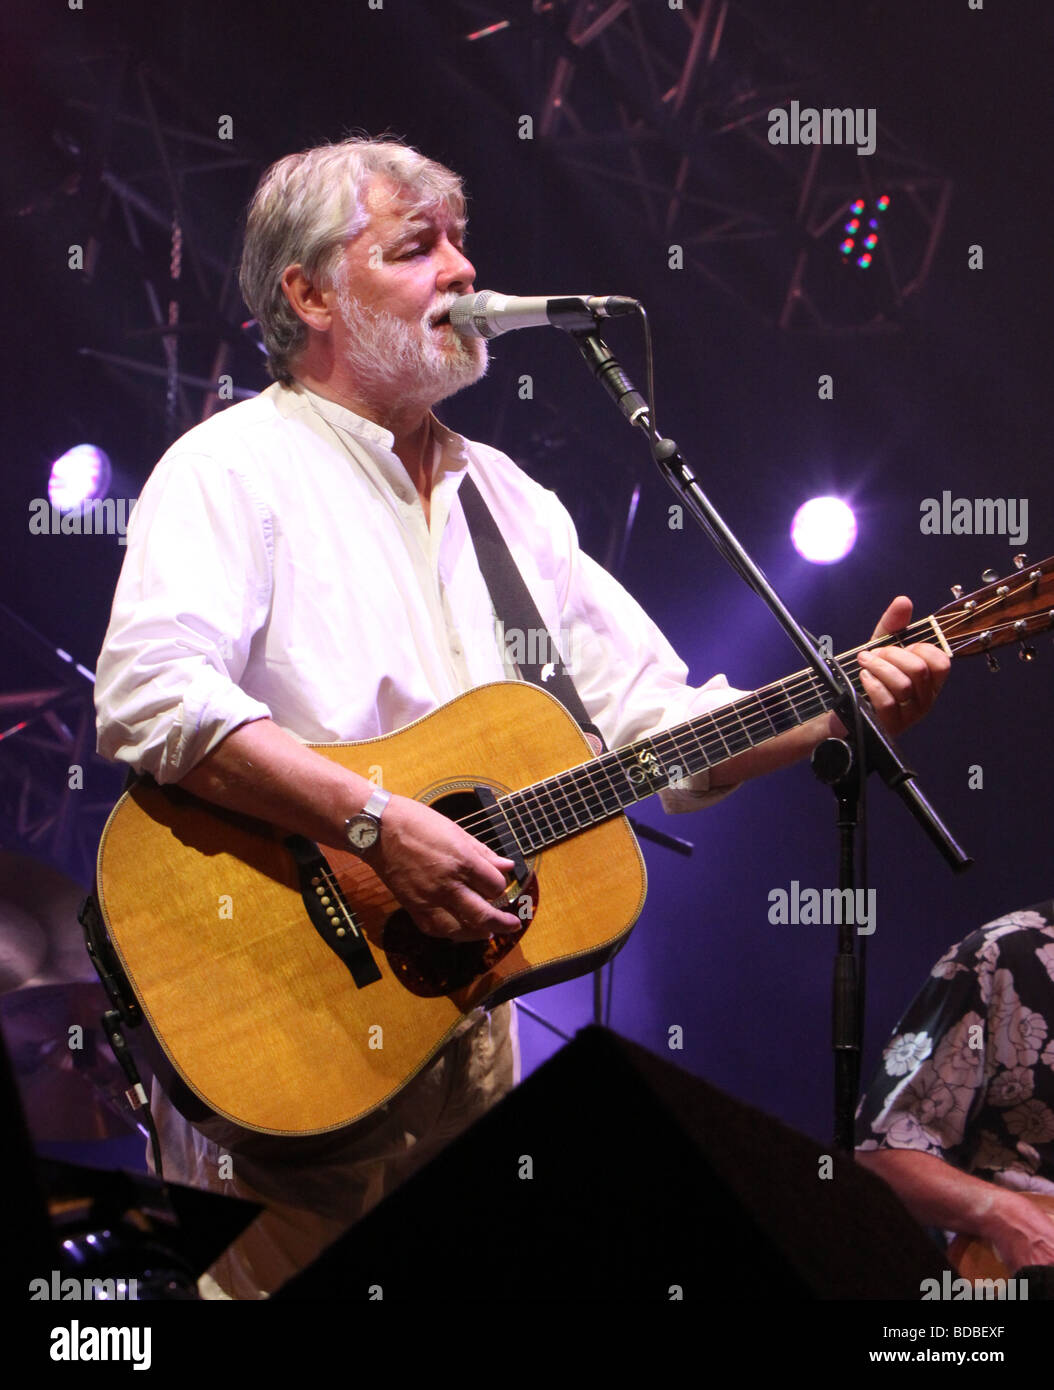 Simon Nicol at Cropredy 2009 - Stock Image